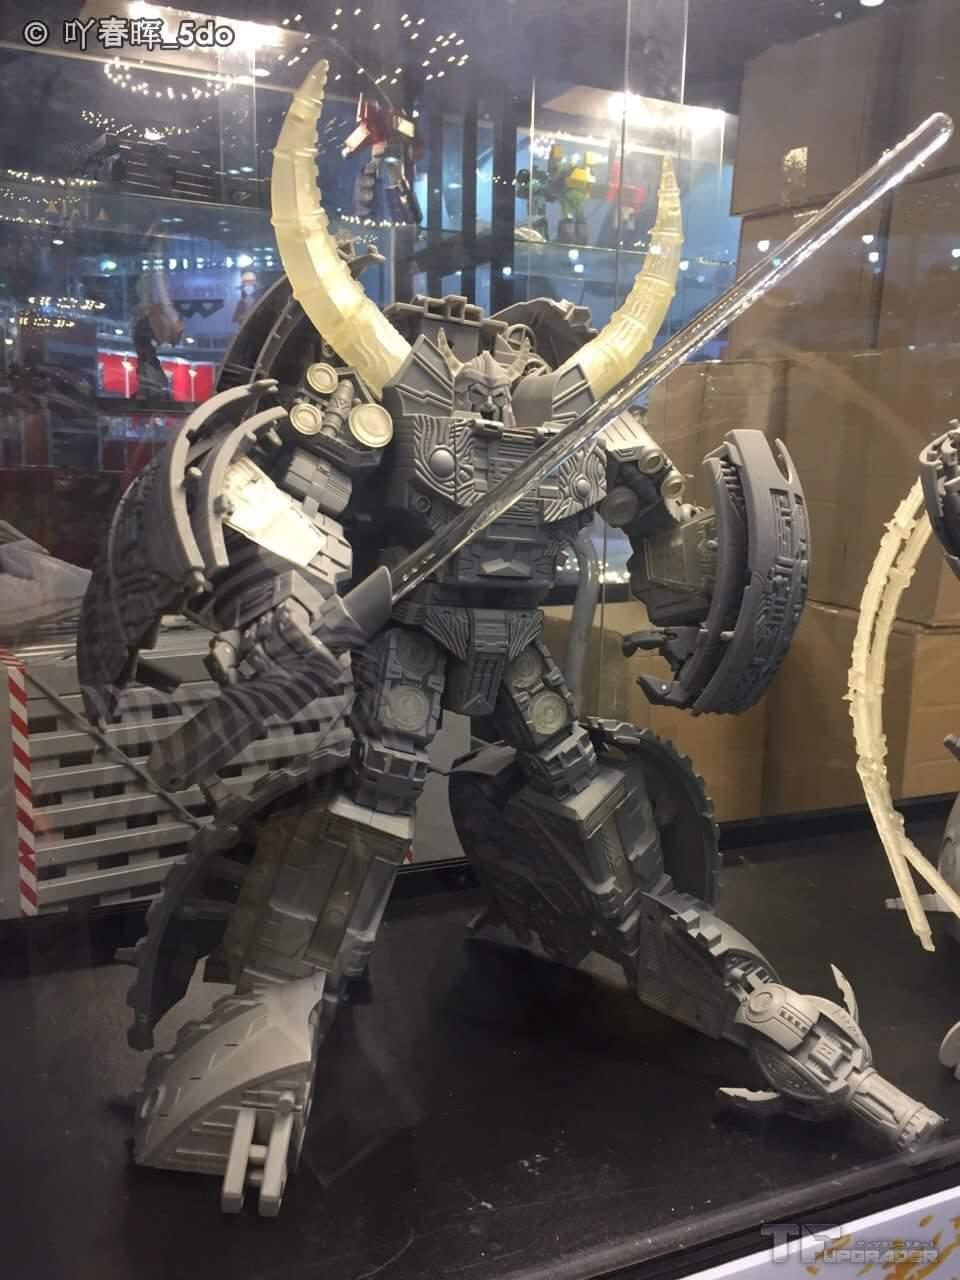 [Garatron] Produit Tiers - Gangs Of Devils G.O.D-02 Galaxy Demolishor - aka Unicron (Beast Wars Neo) VpNaqEbE